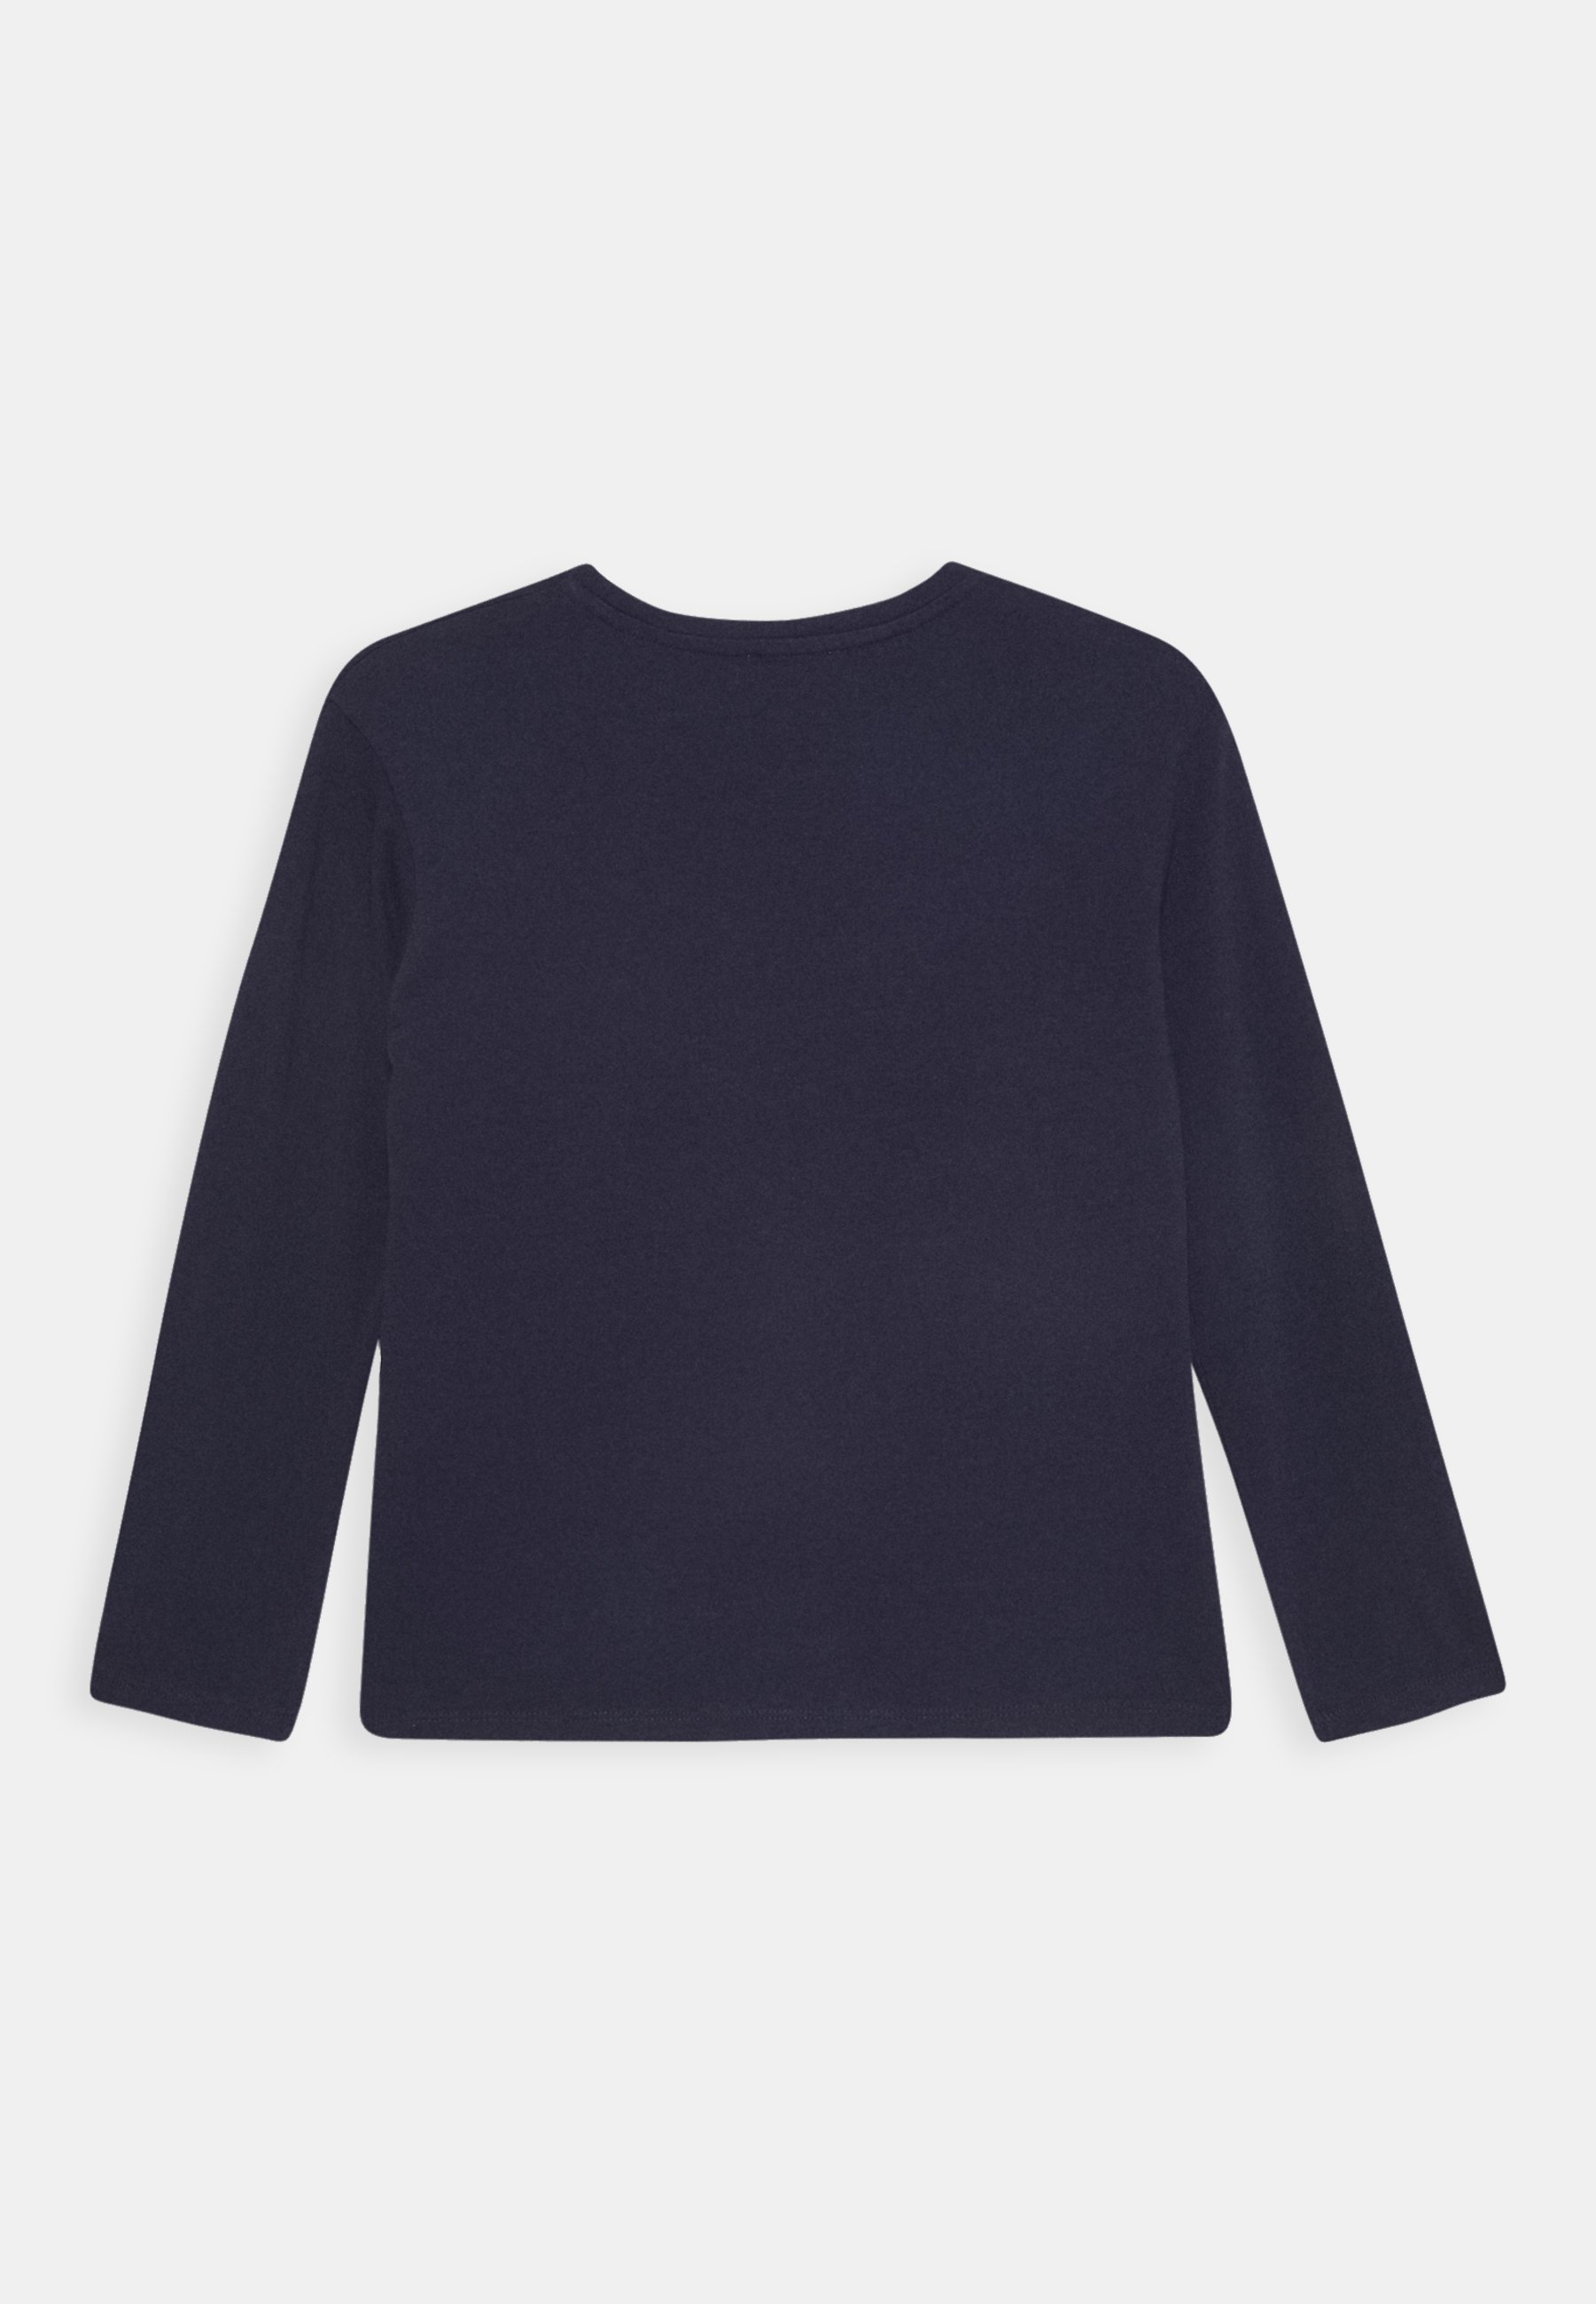 Långärmade T shirts | Dam | Köp T shirts online på Zalando.se